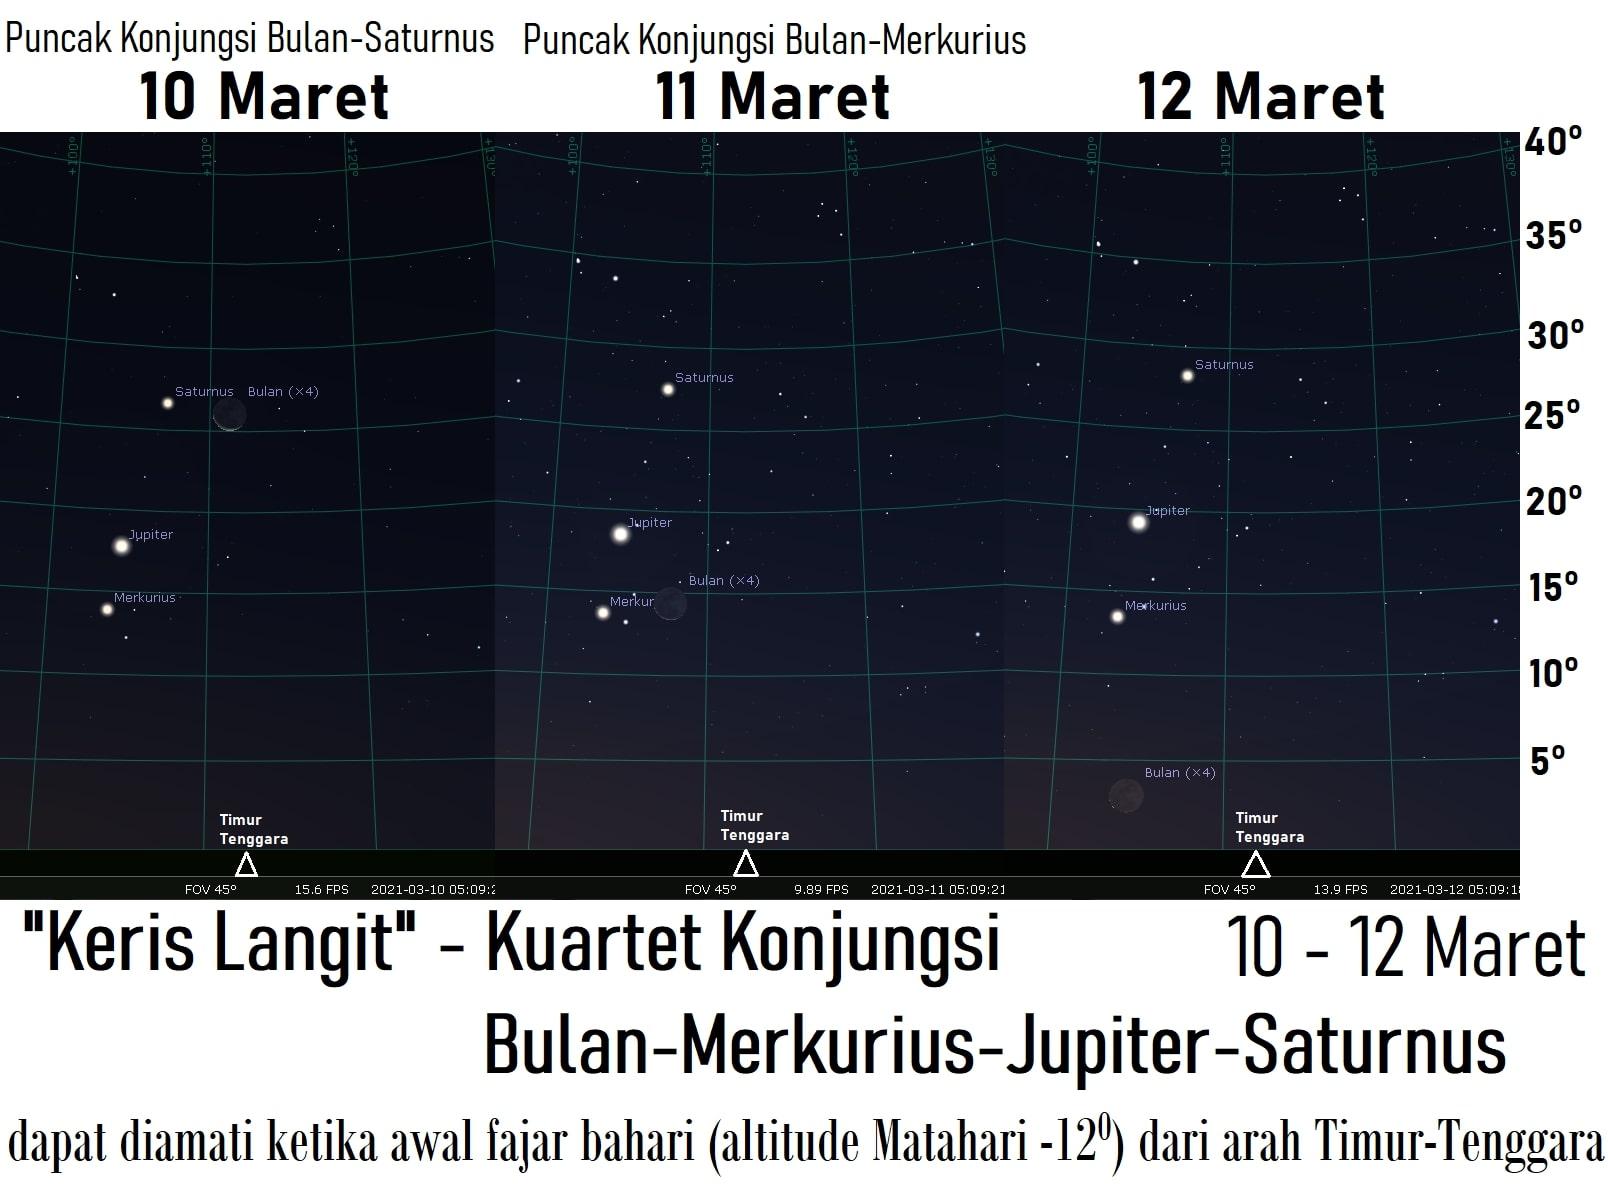 Kuartet Konjungsi Bulan - Saturnus - Jupiter - Merkurius